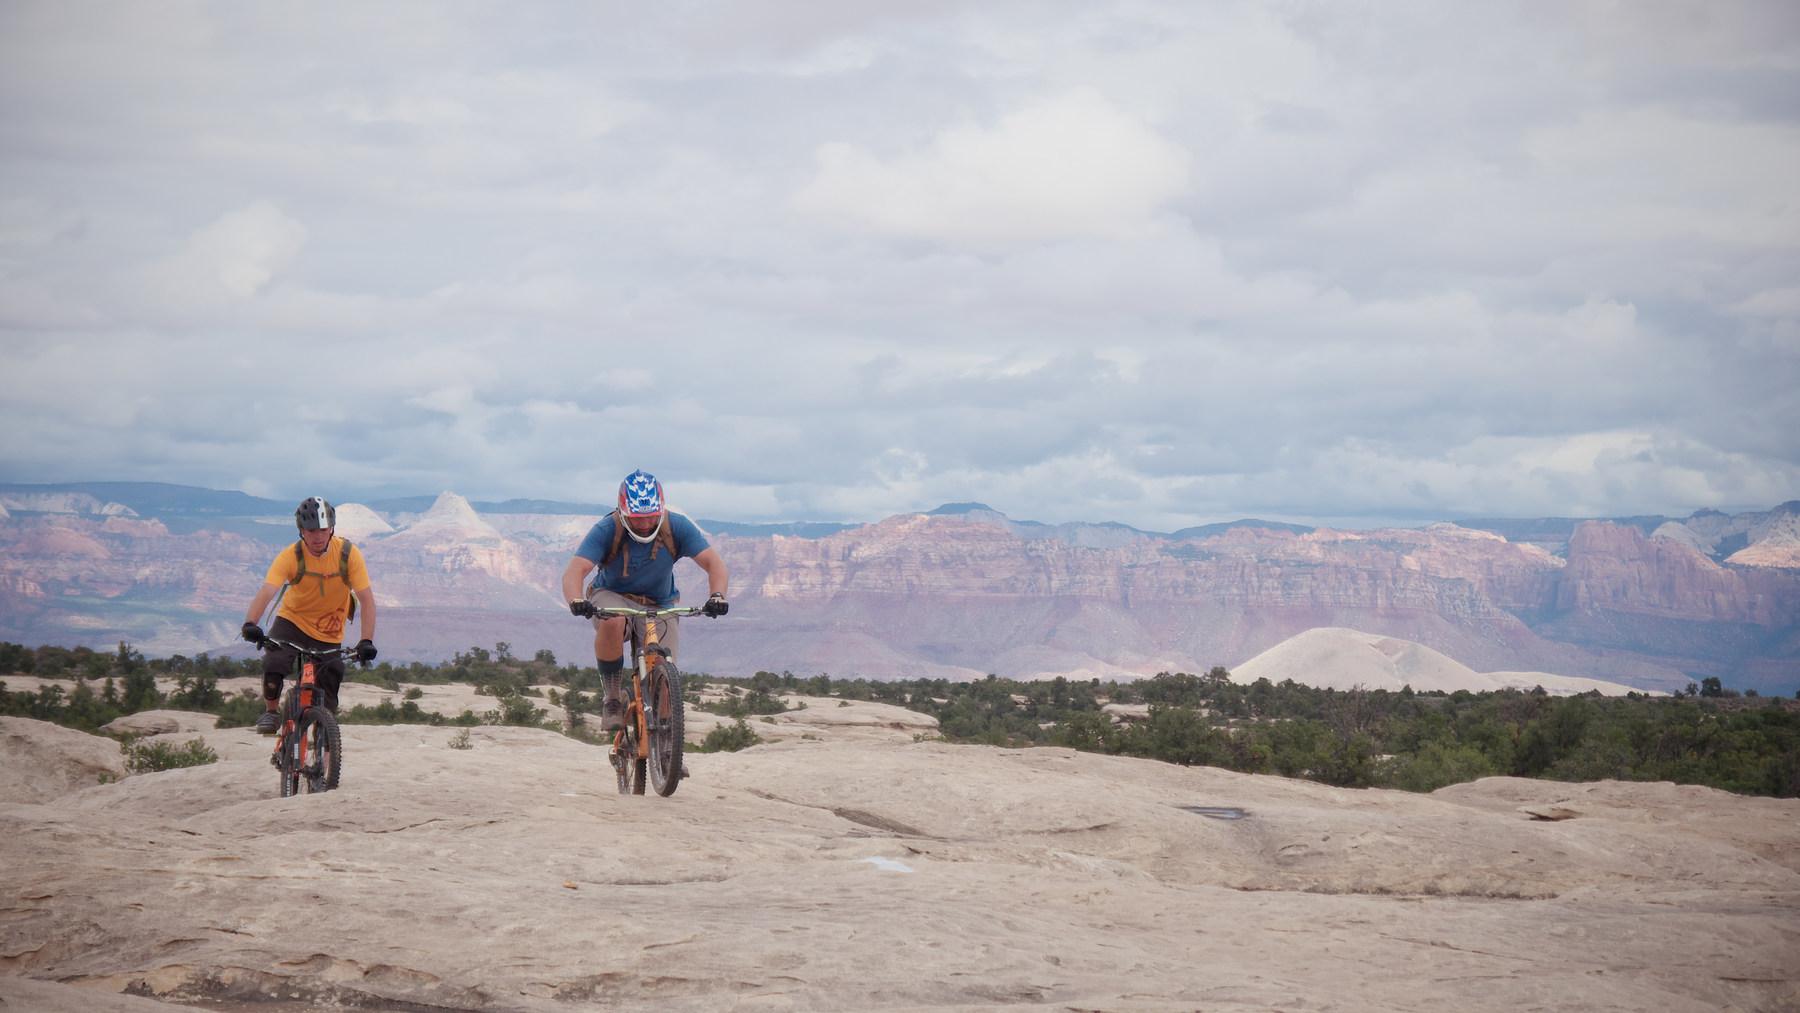 gooseberry mesa mountain biking south rim hidden canyon white